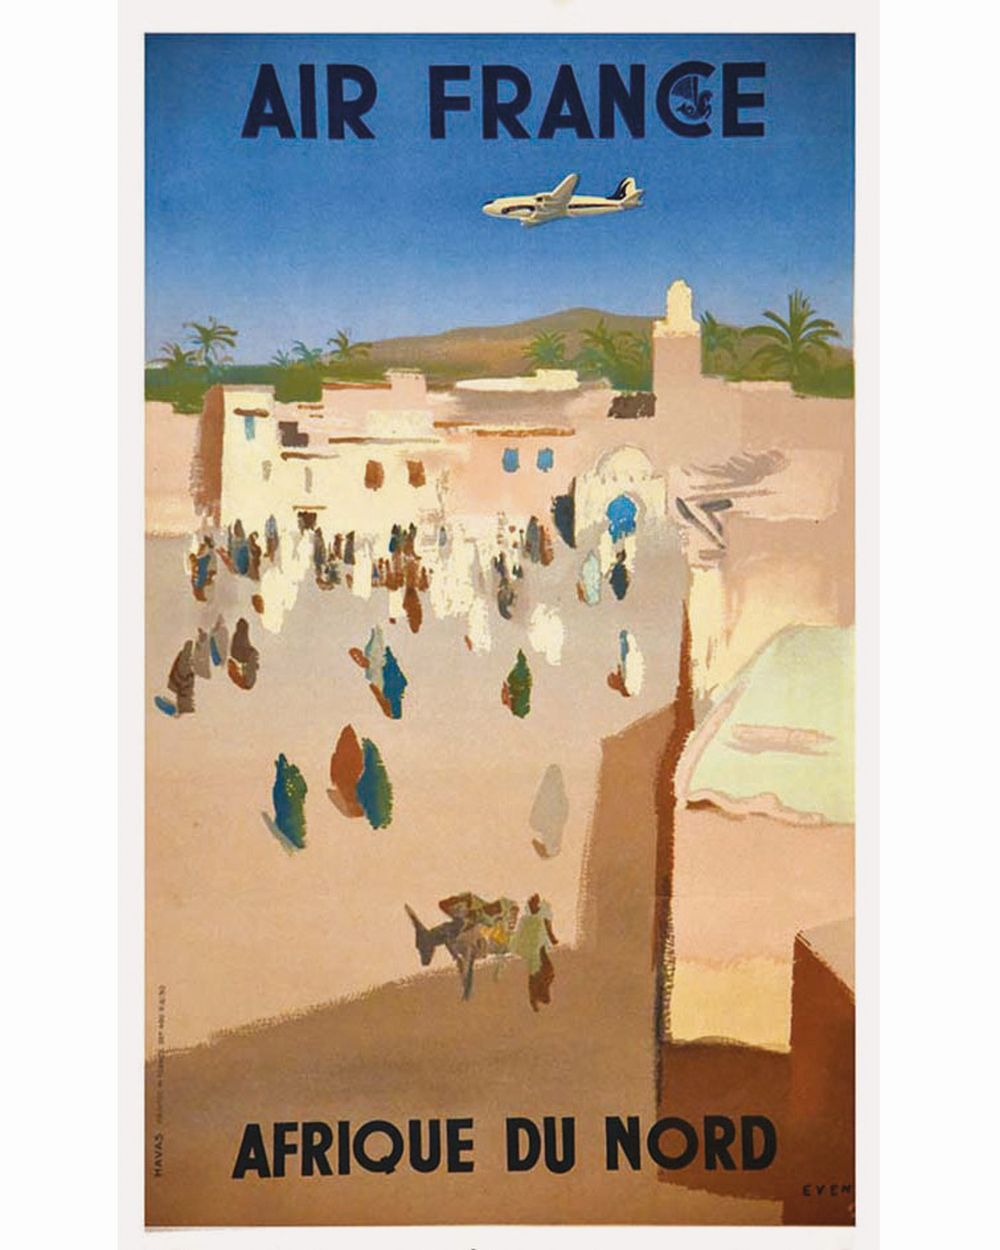 EVEN - Afrique du Nord Air France     1950